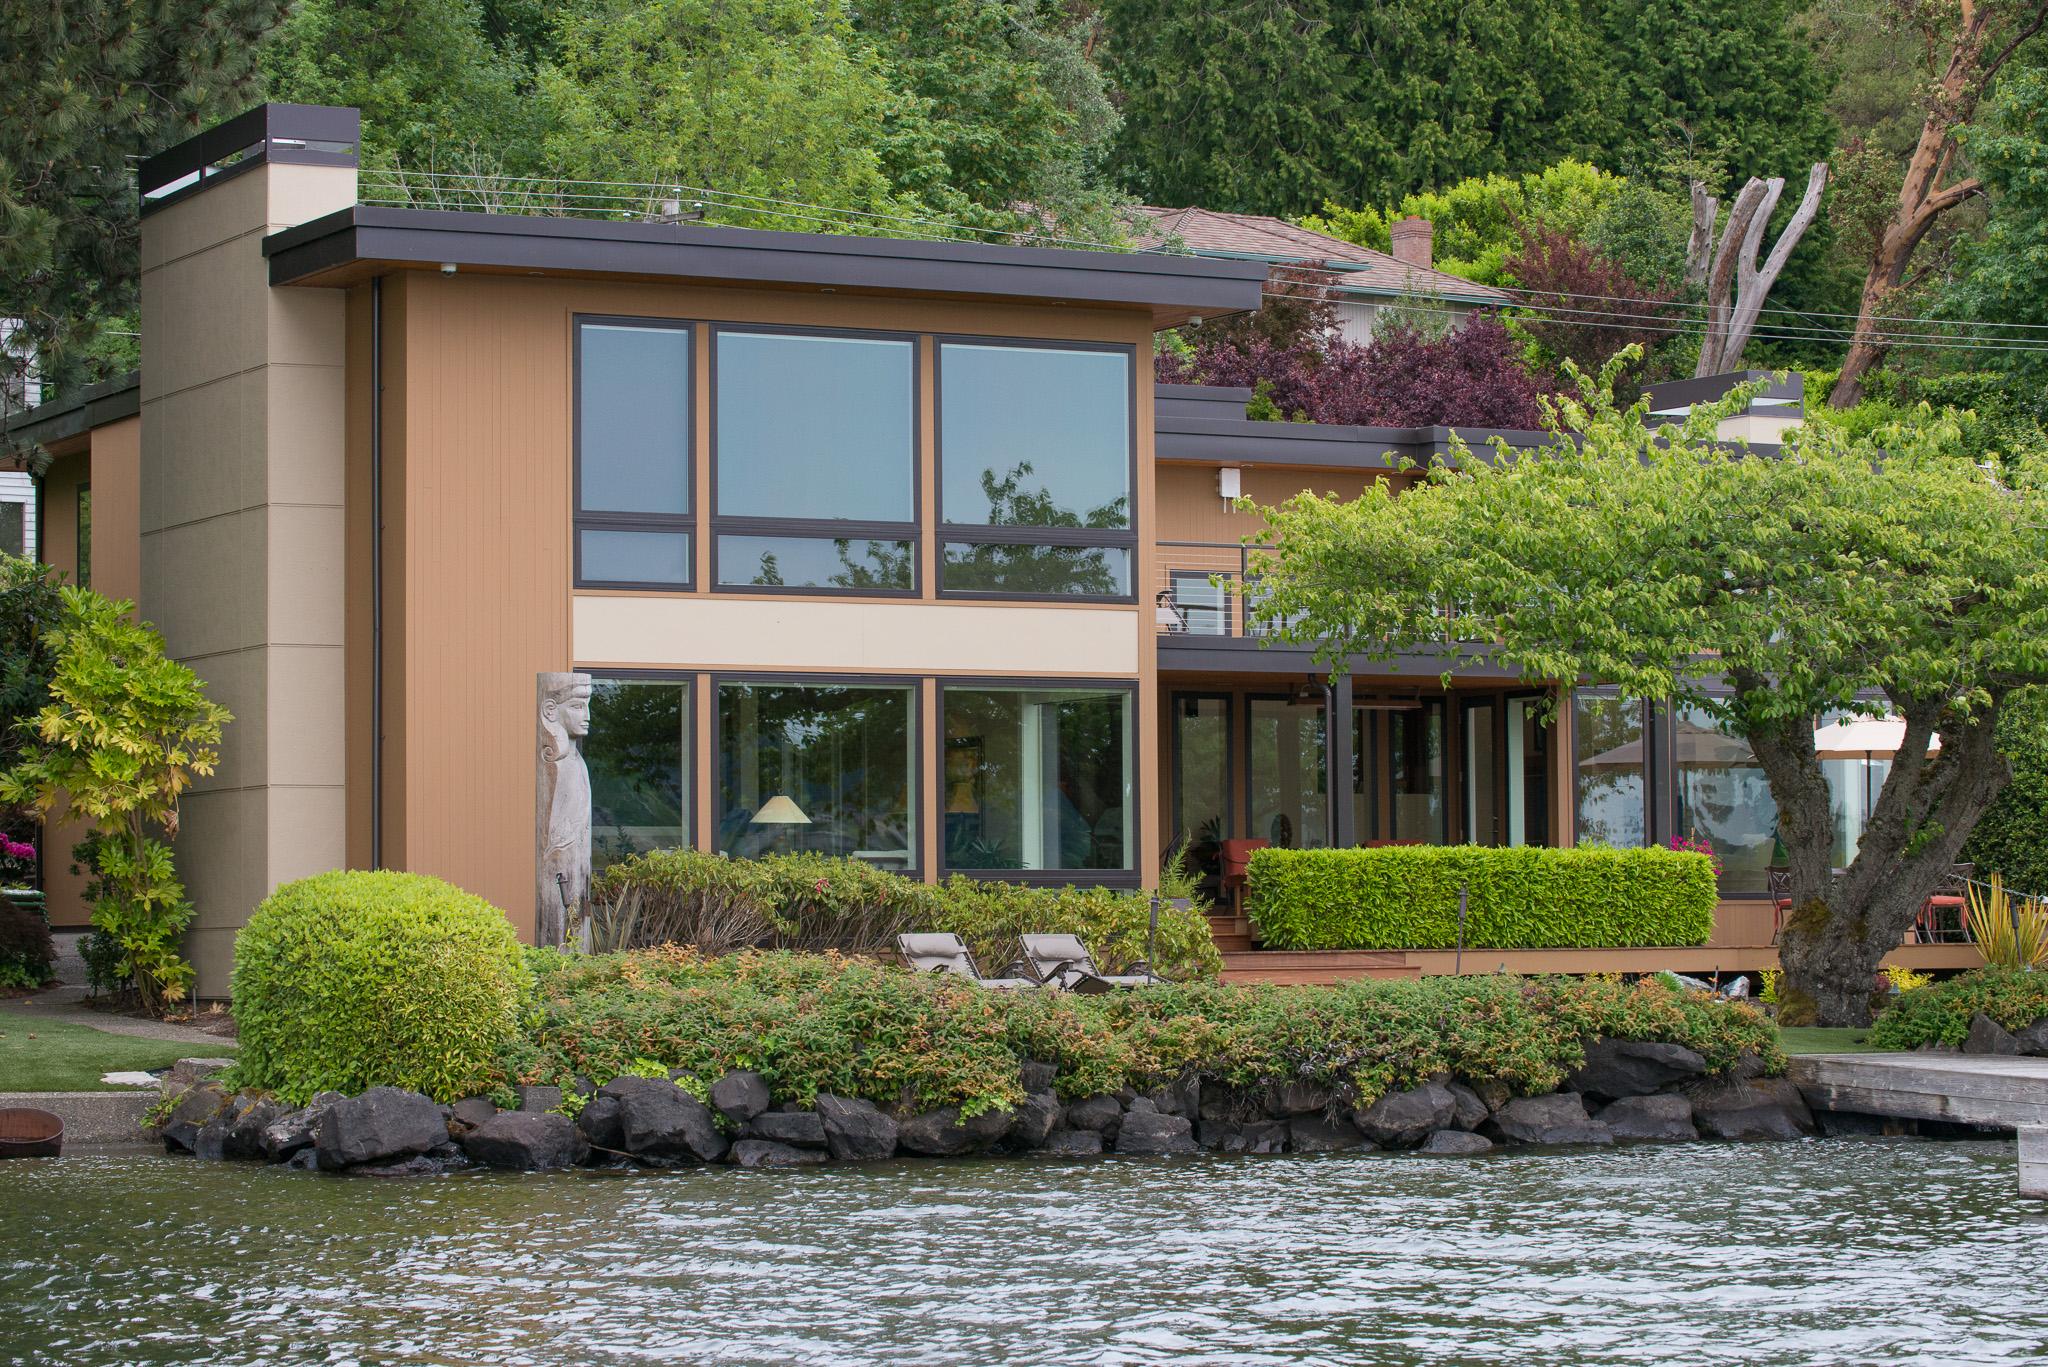 10 - Lake Washington House - Swift Studio - 2048px.jpg